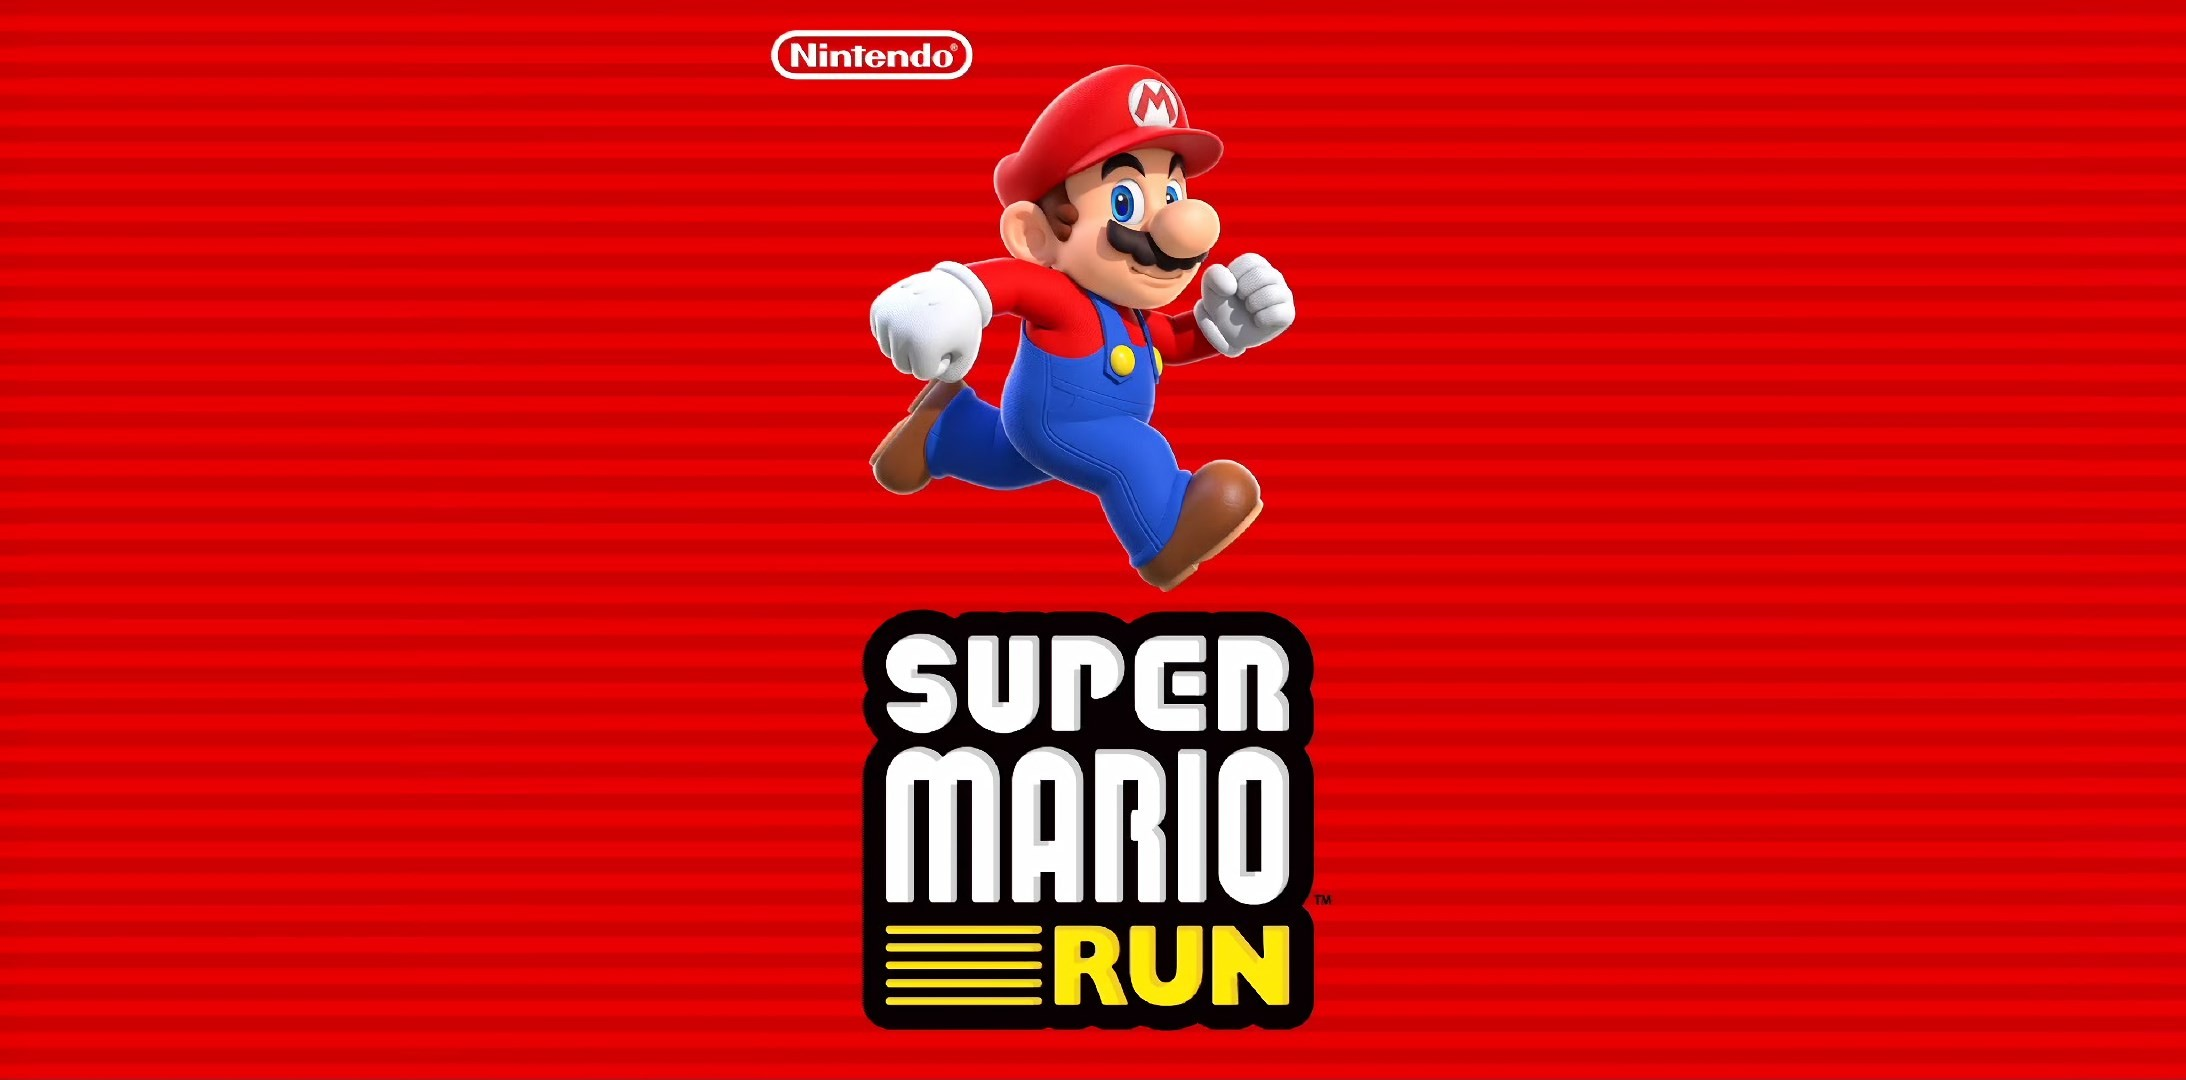 super mario run wallpaper pack 1080p hd – super mario run category